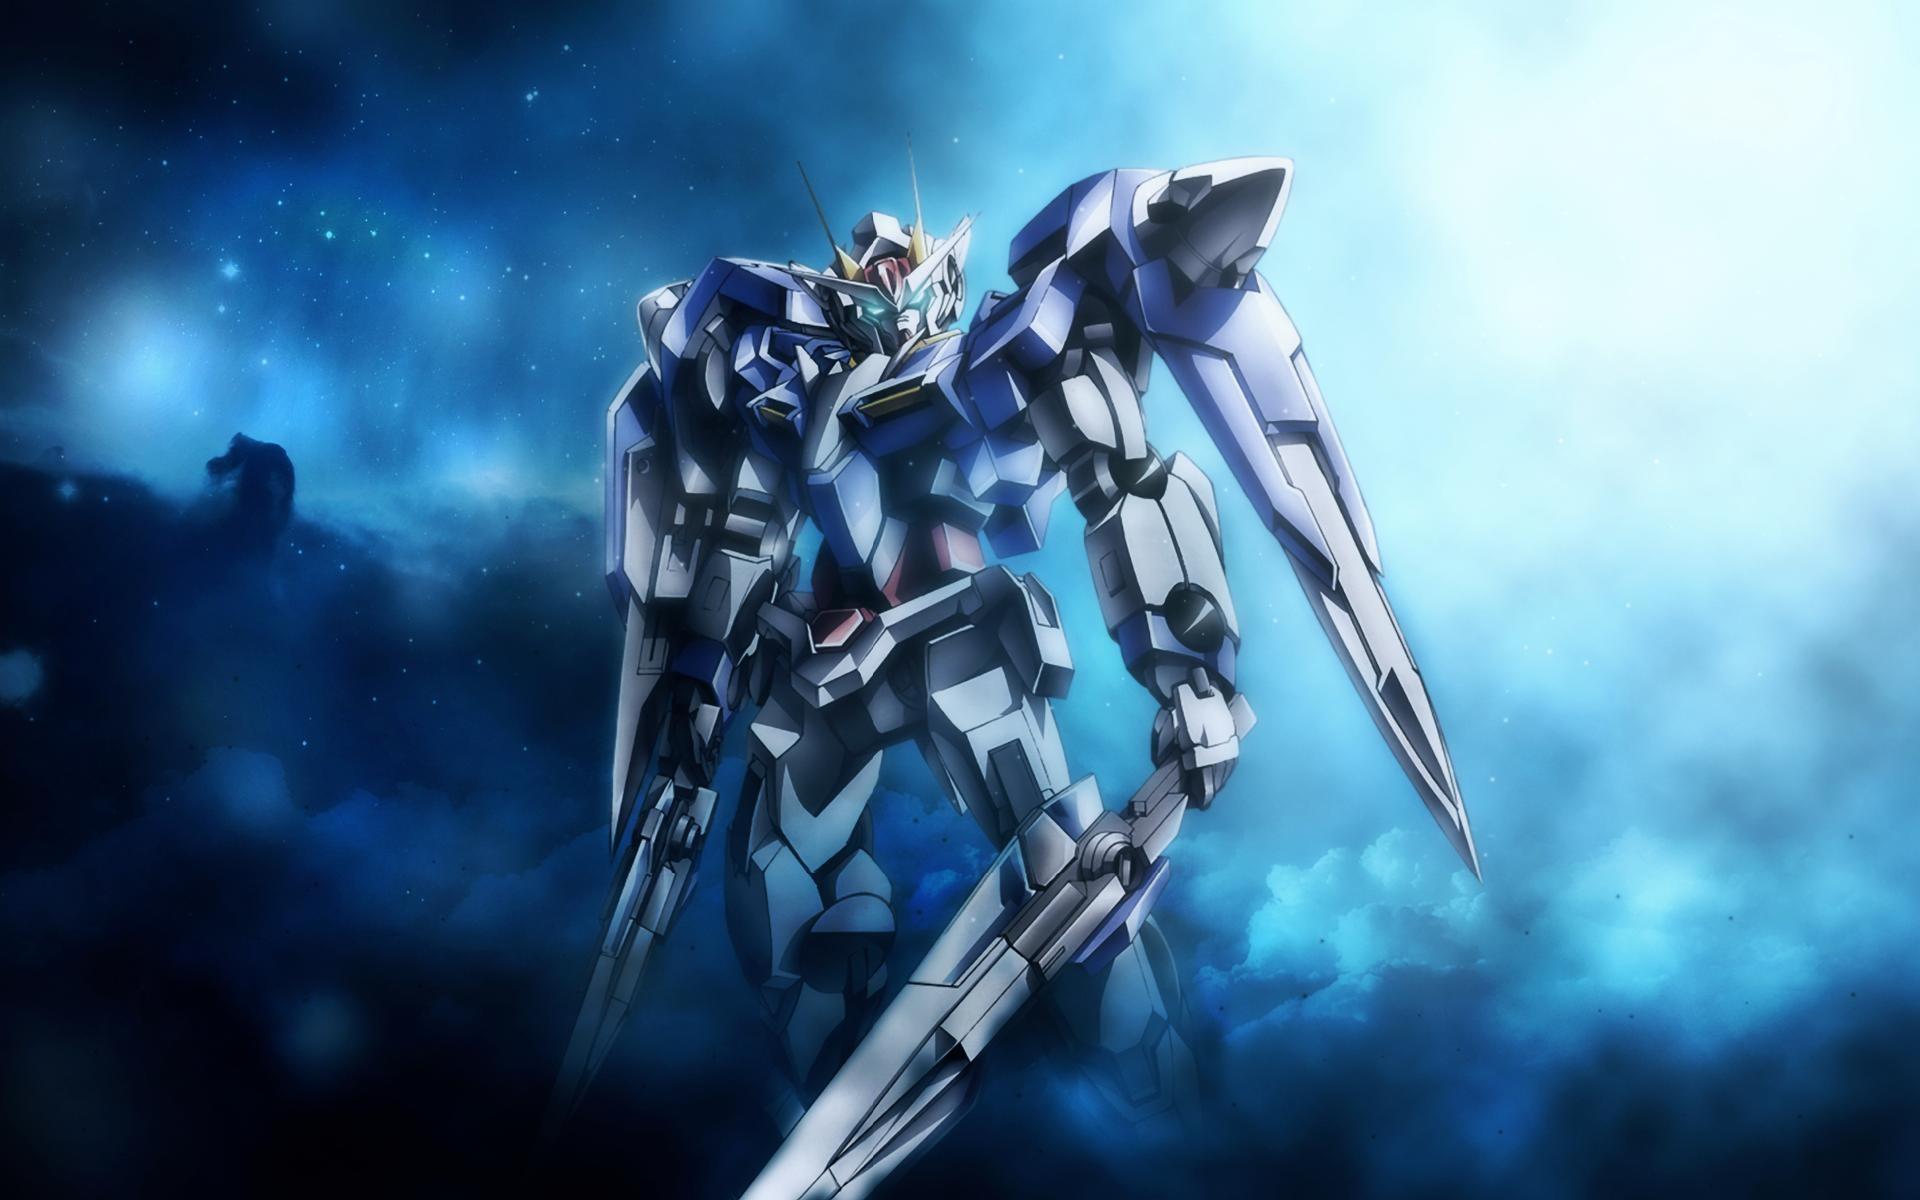 Gundam 00 Hd Wallpaper 71 Images